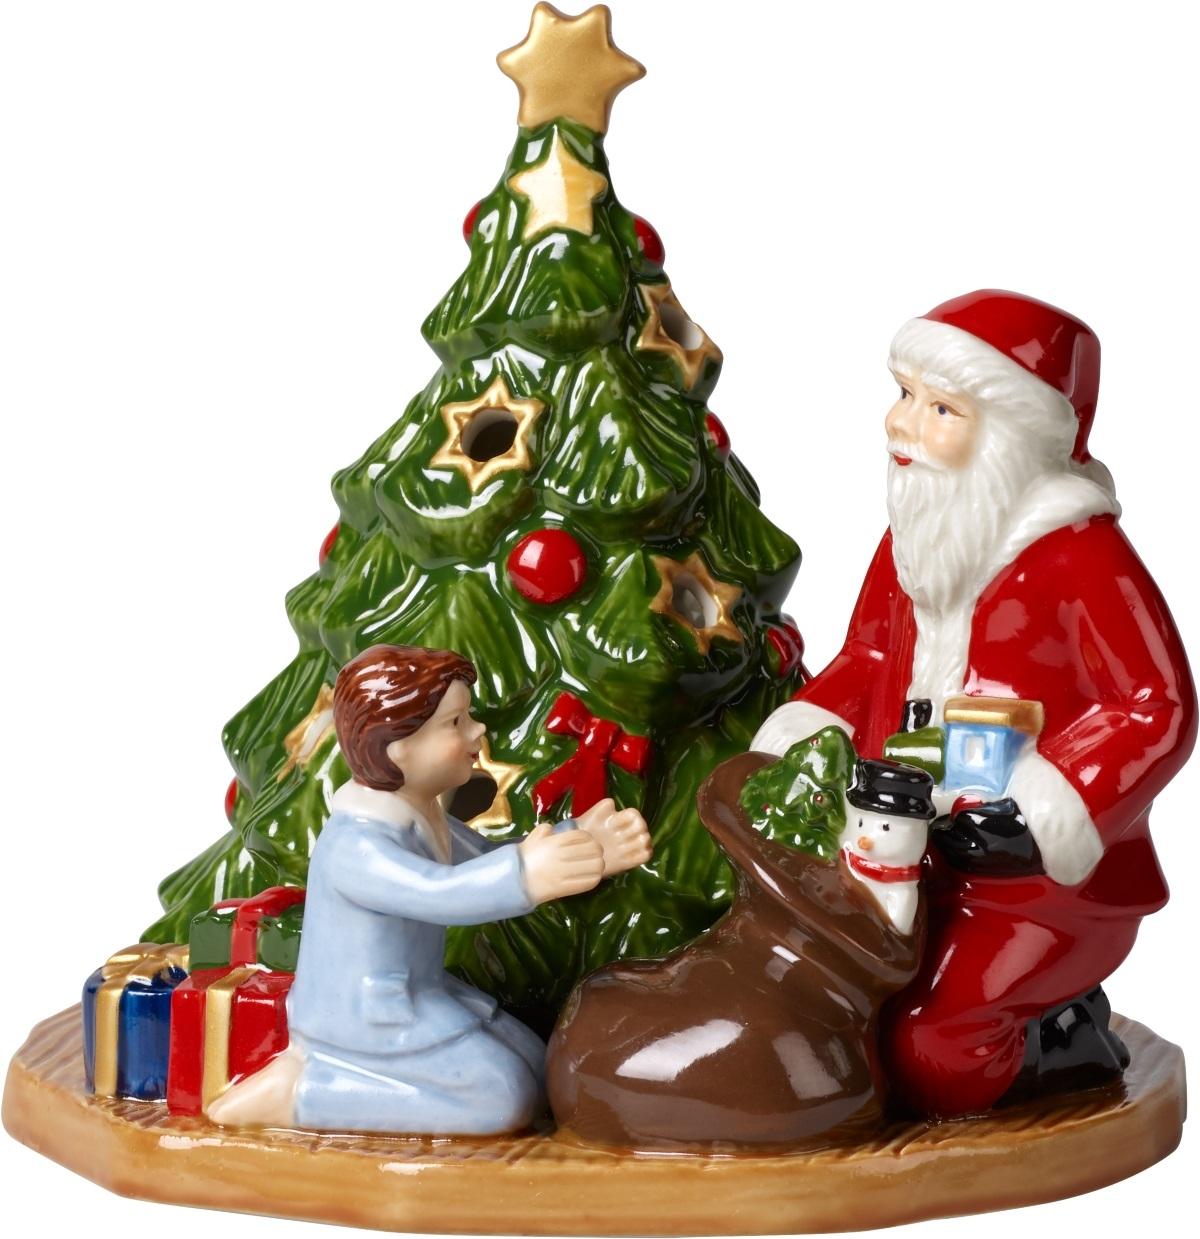 Suport lumanari Villeroy & Boch Christmas Toys Gift Giving 14 5x14x13 5cm imagine